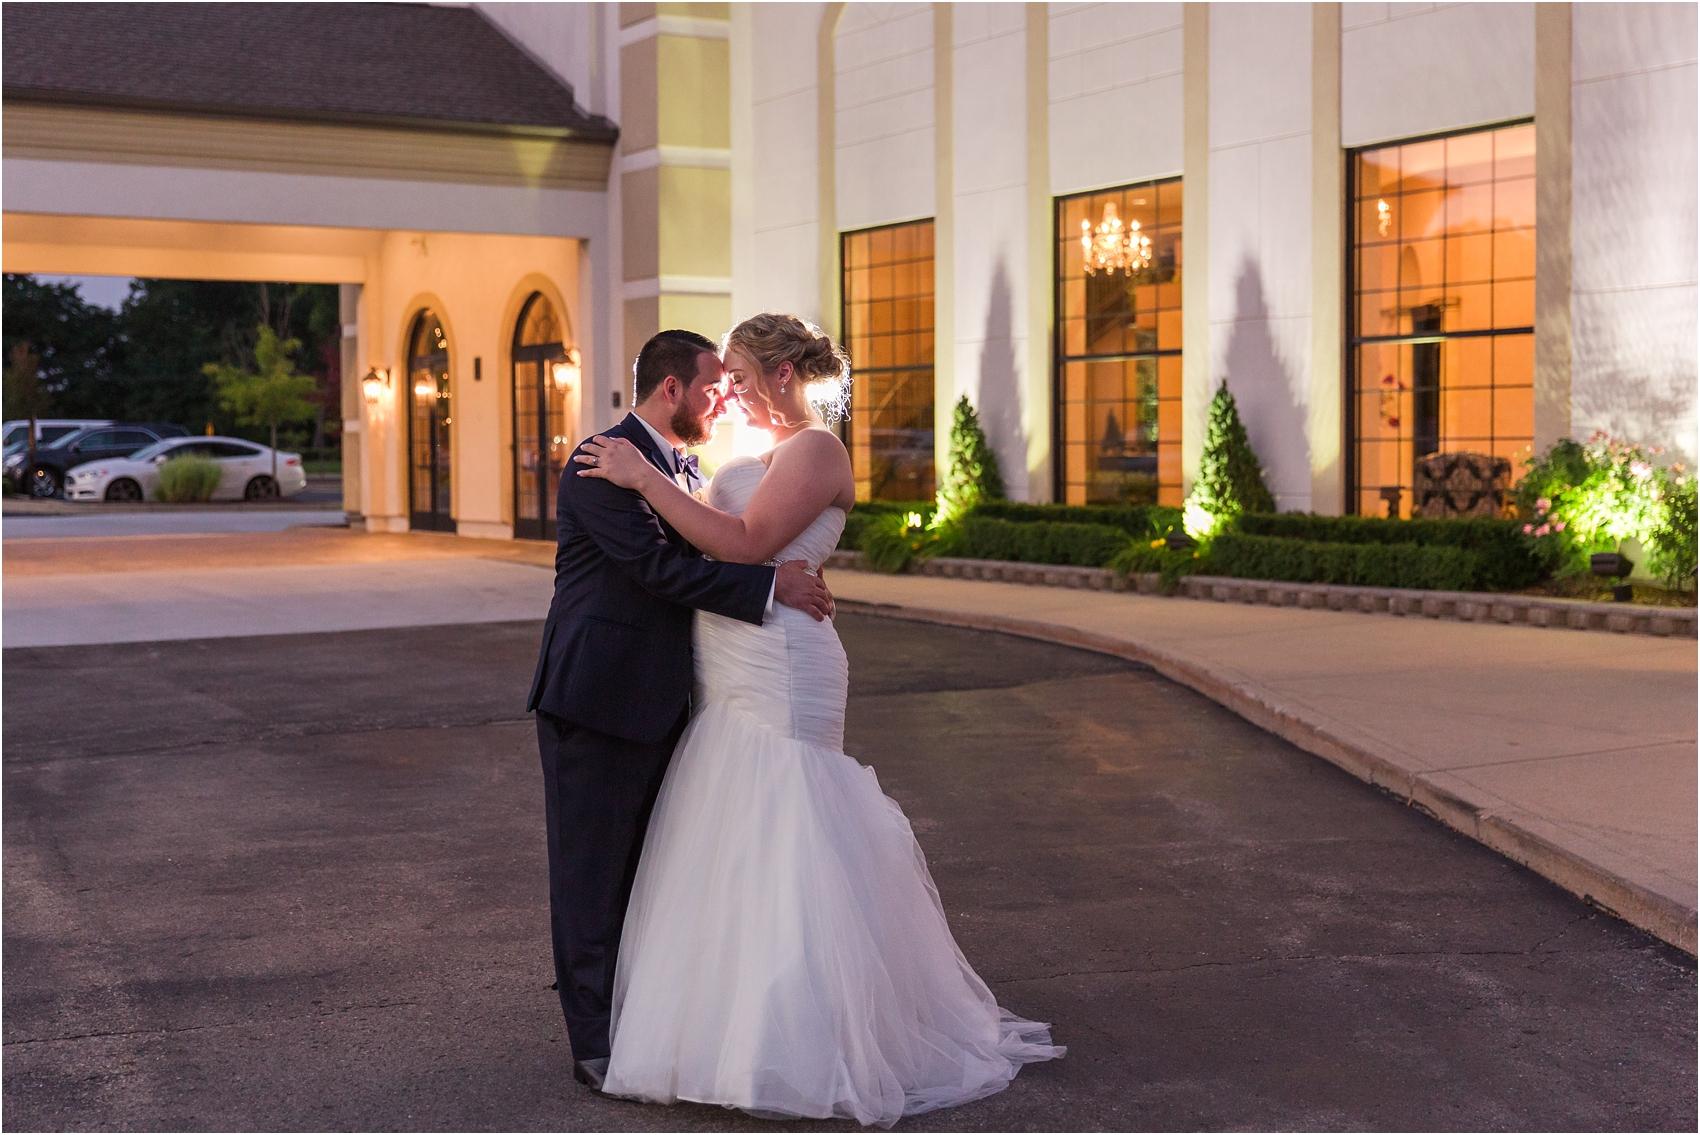 joyful-and-candid-navy-blush-wedding-photos-at-crystal-gardens-in-howell-mi-by-courtney-carolyn-photography_0121.jpg